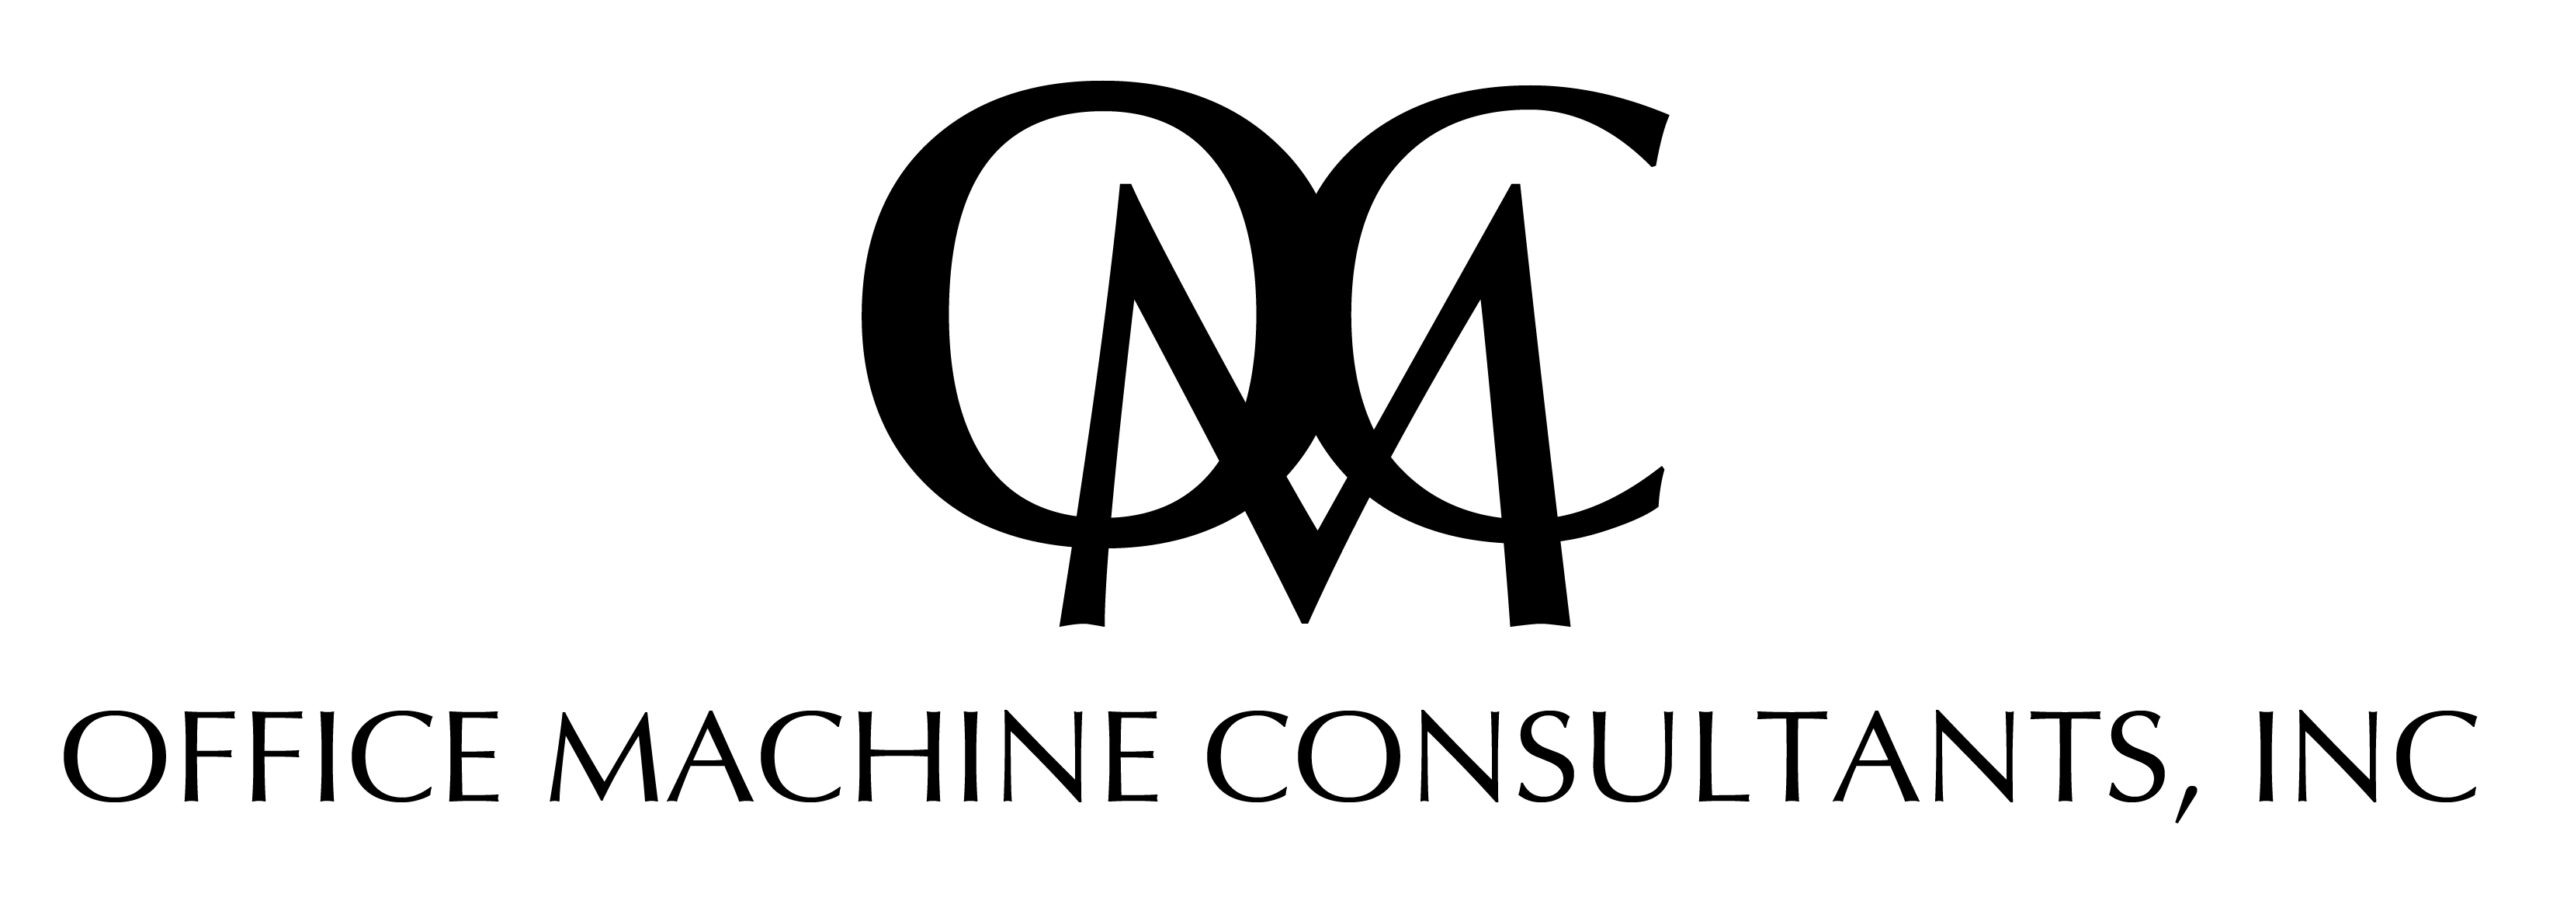 Office Machine Consultants, Inc.